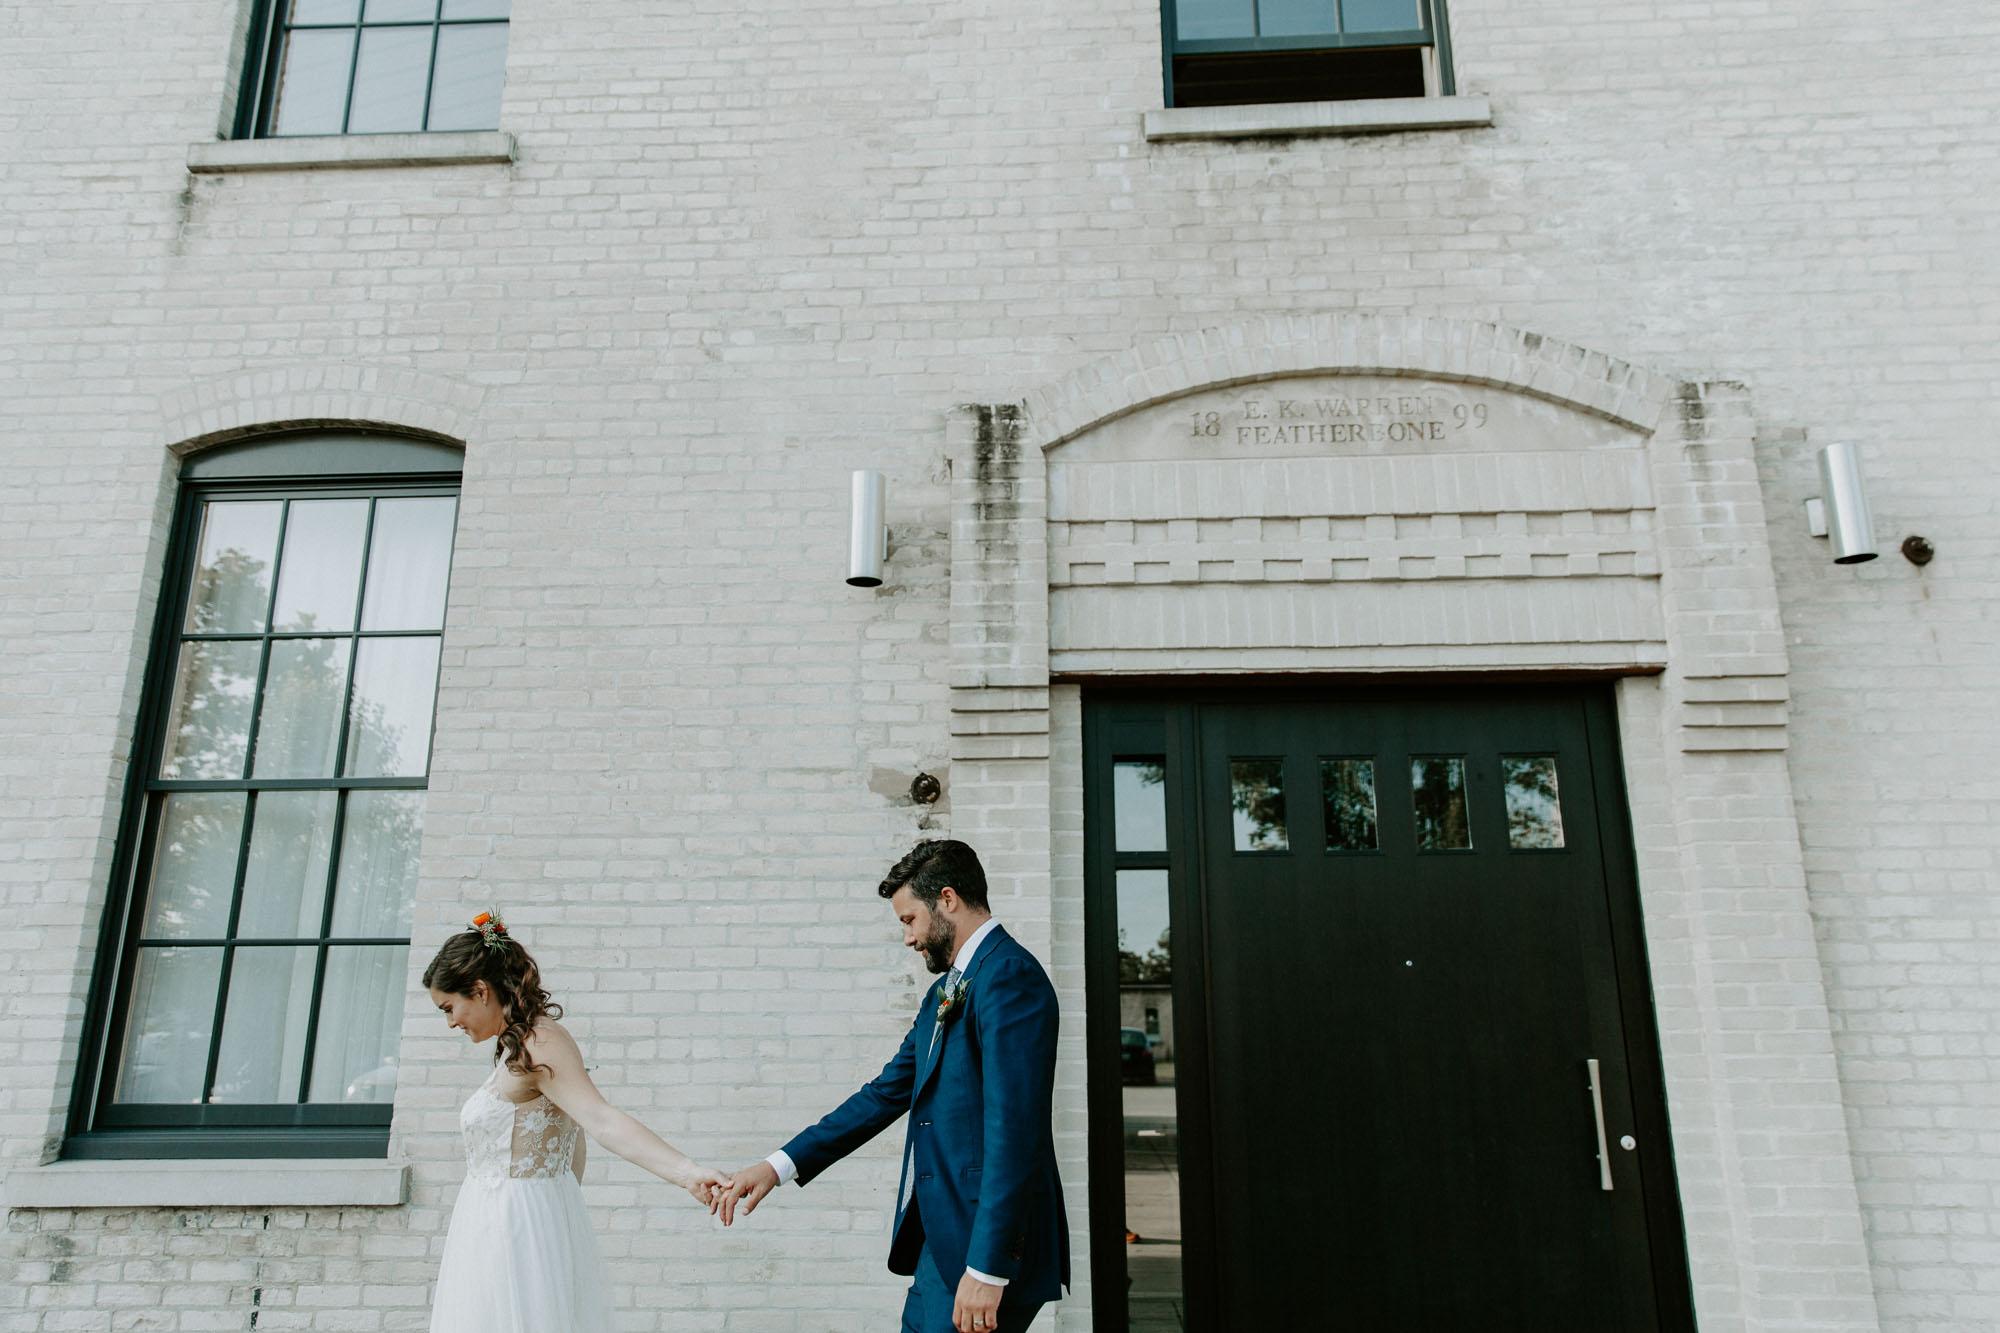 journeyman_distillery_wedding_photographer_chicago_il_wright_photographs-6701.jpg